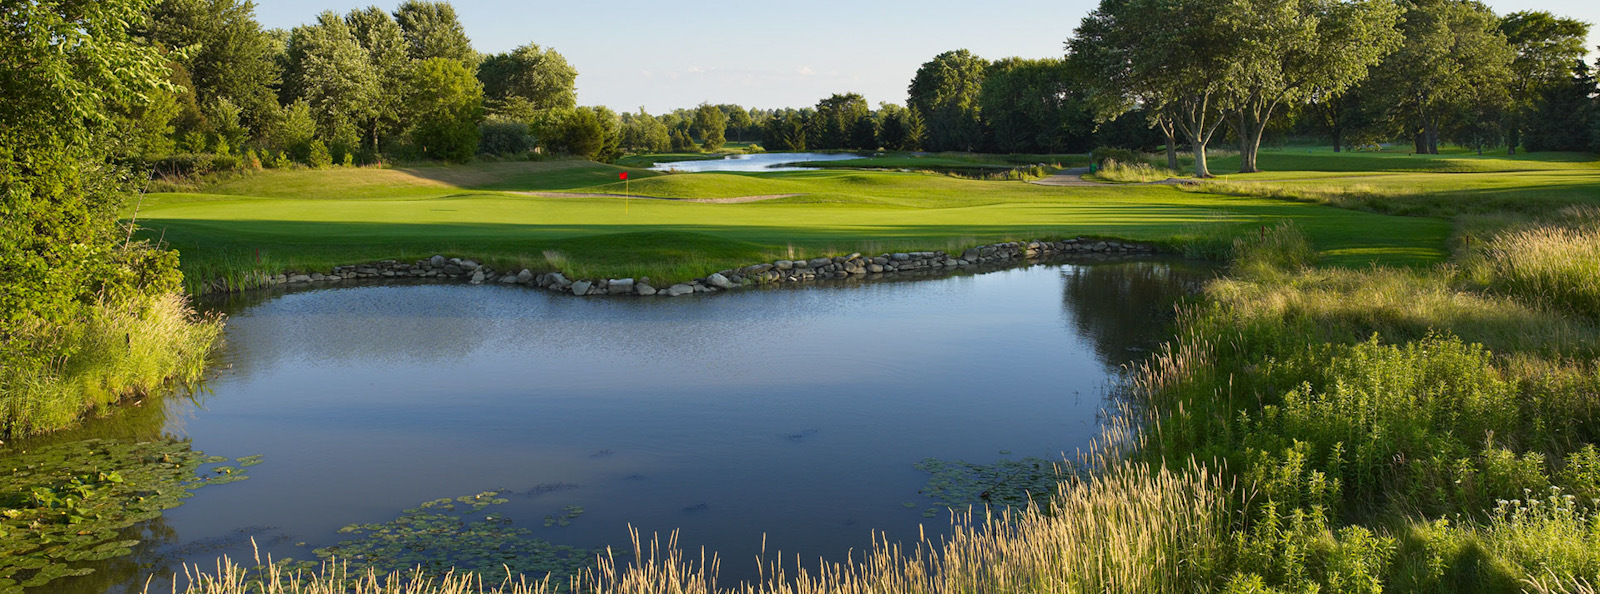 Royal Ashburn golf course